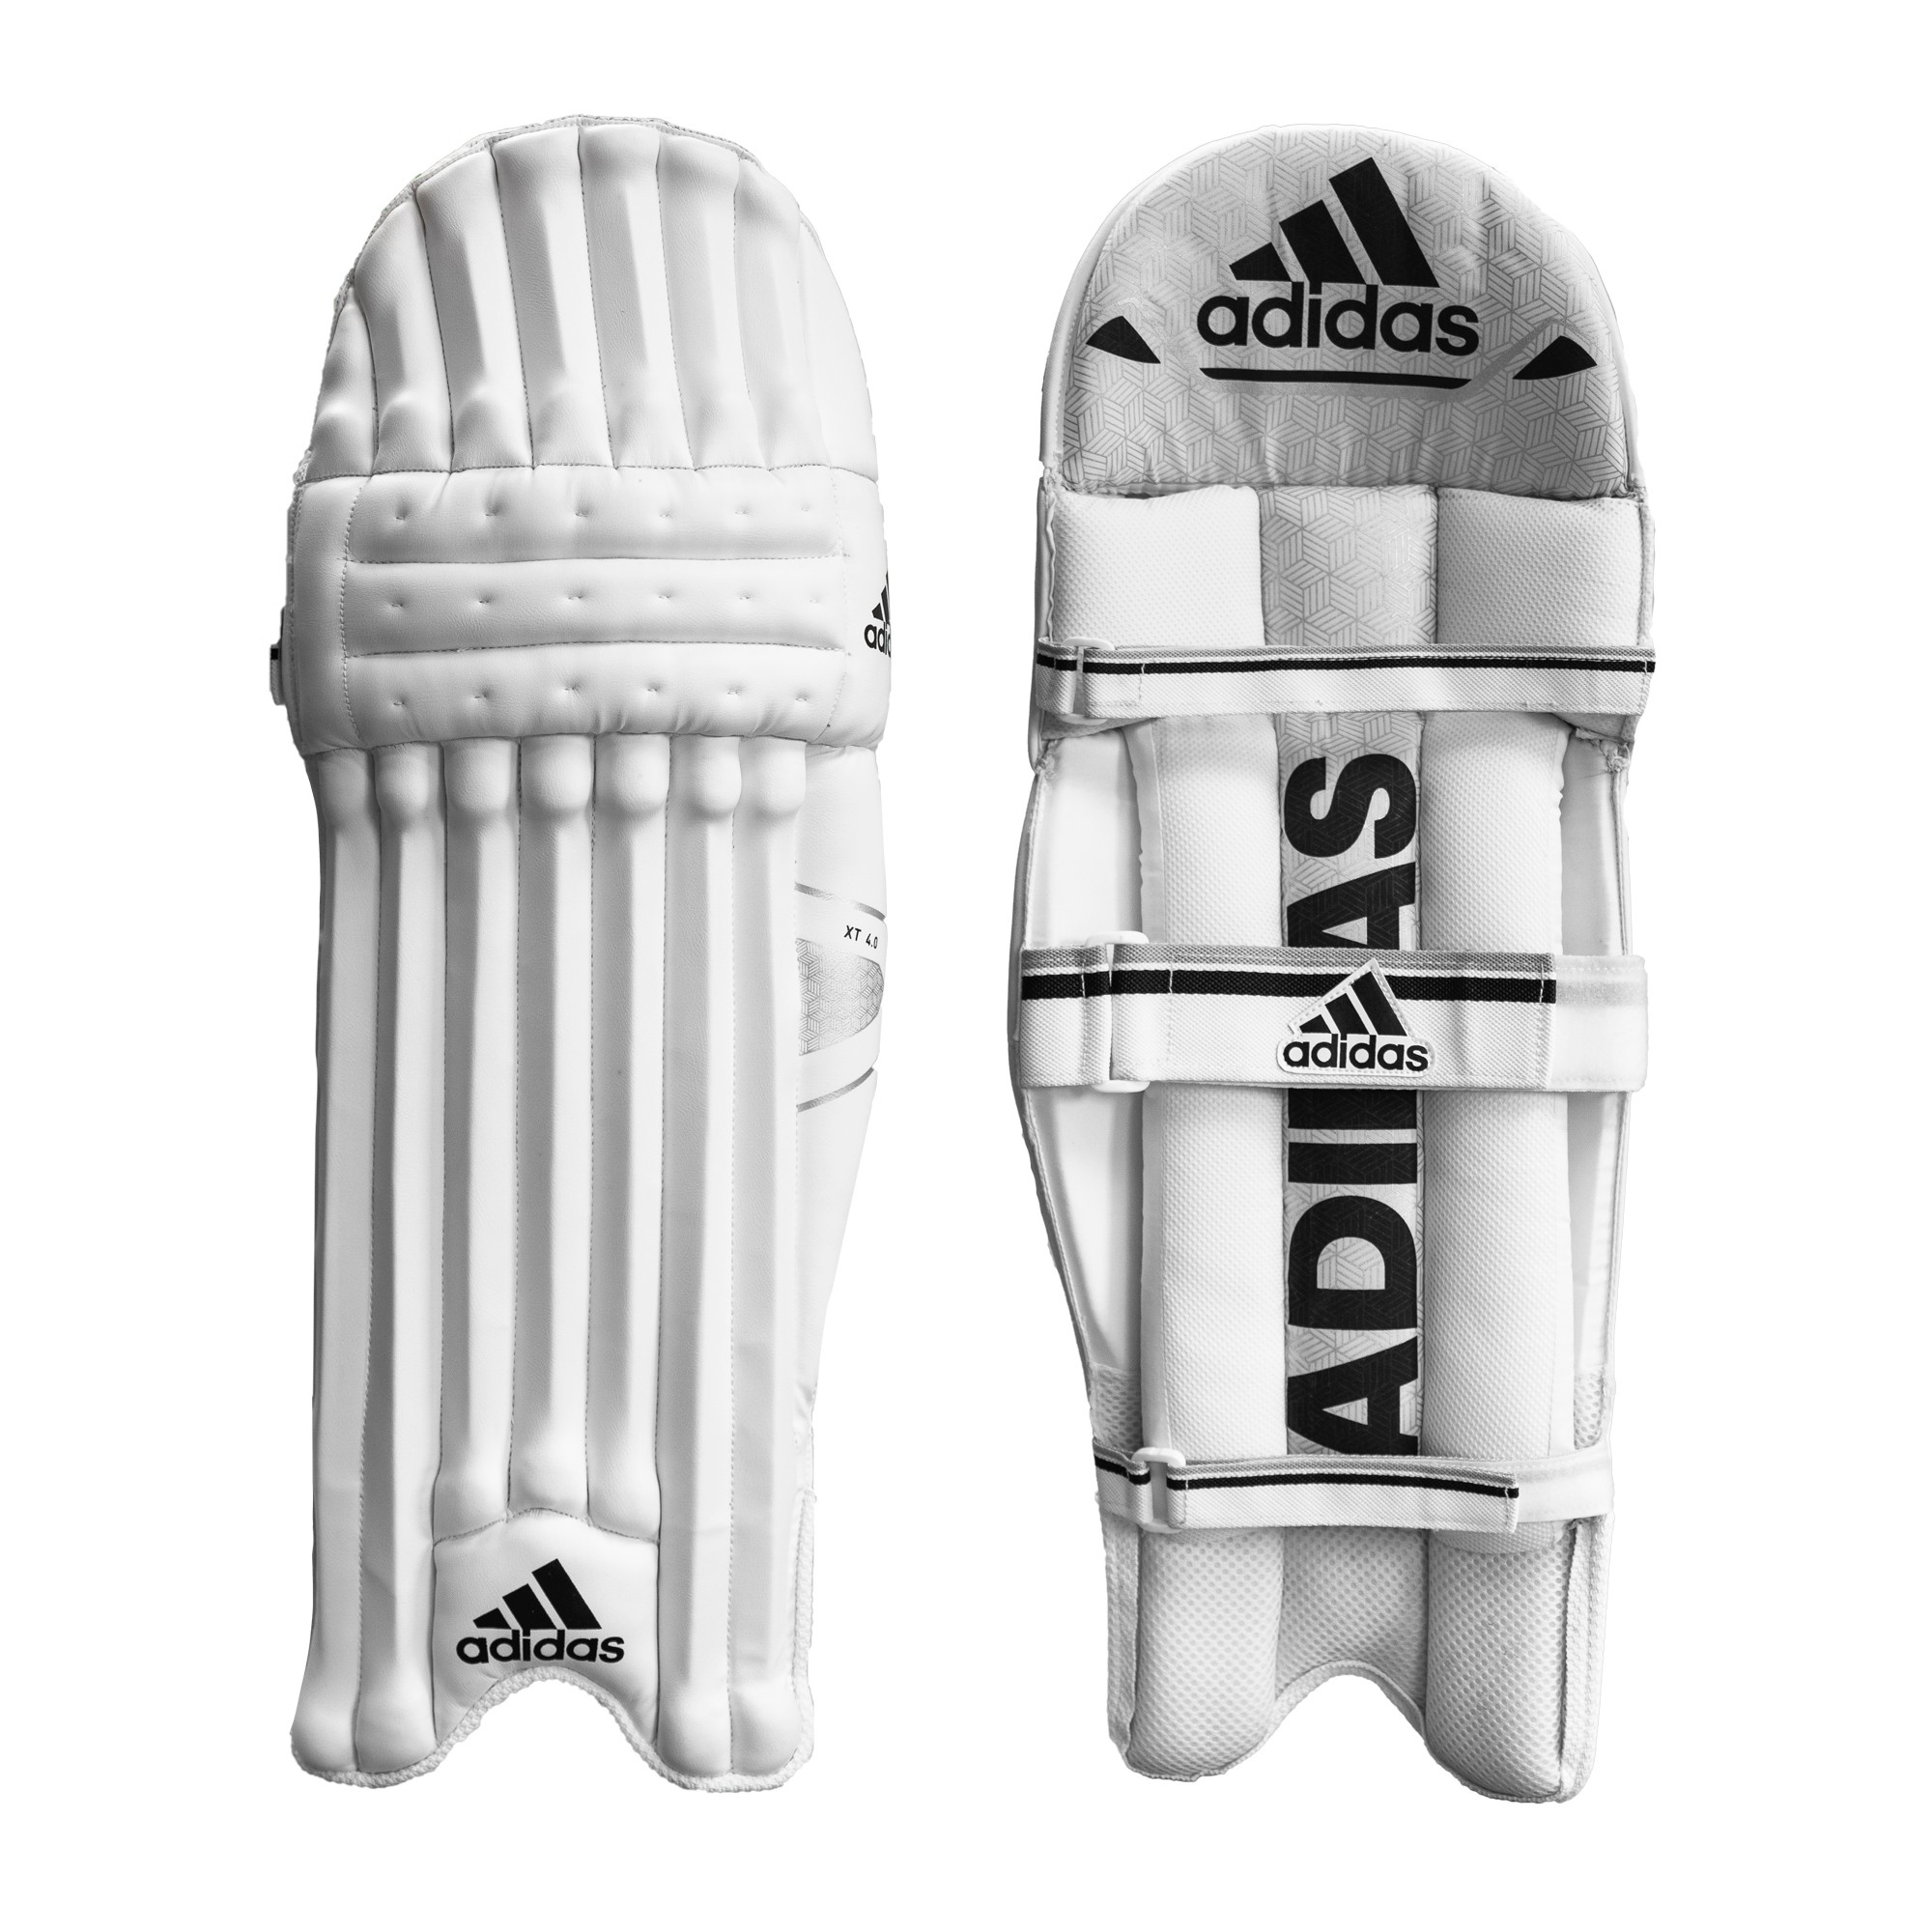 2019 Adidas XT 4.0 Junior Batting Pads